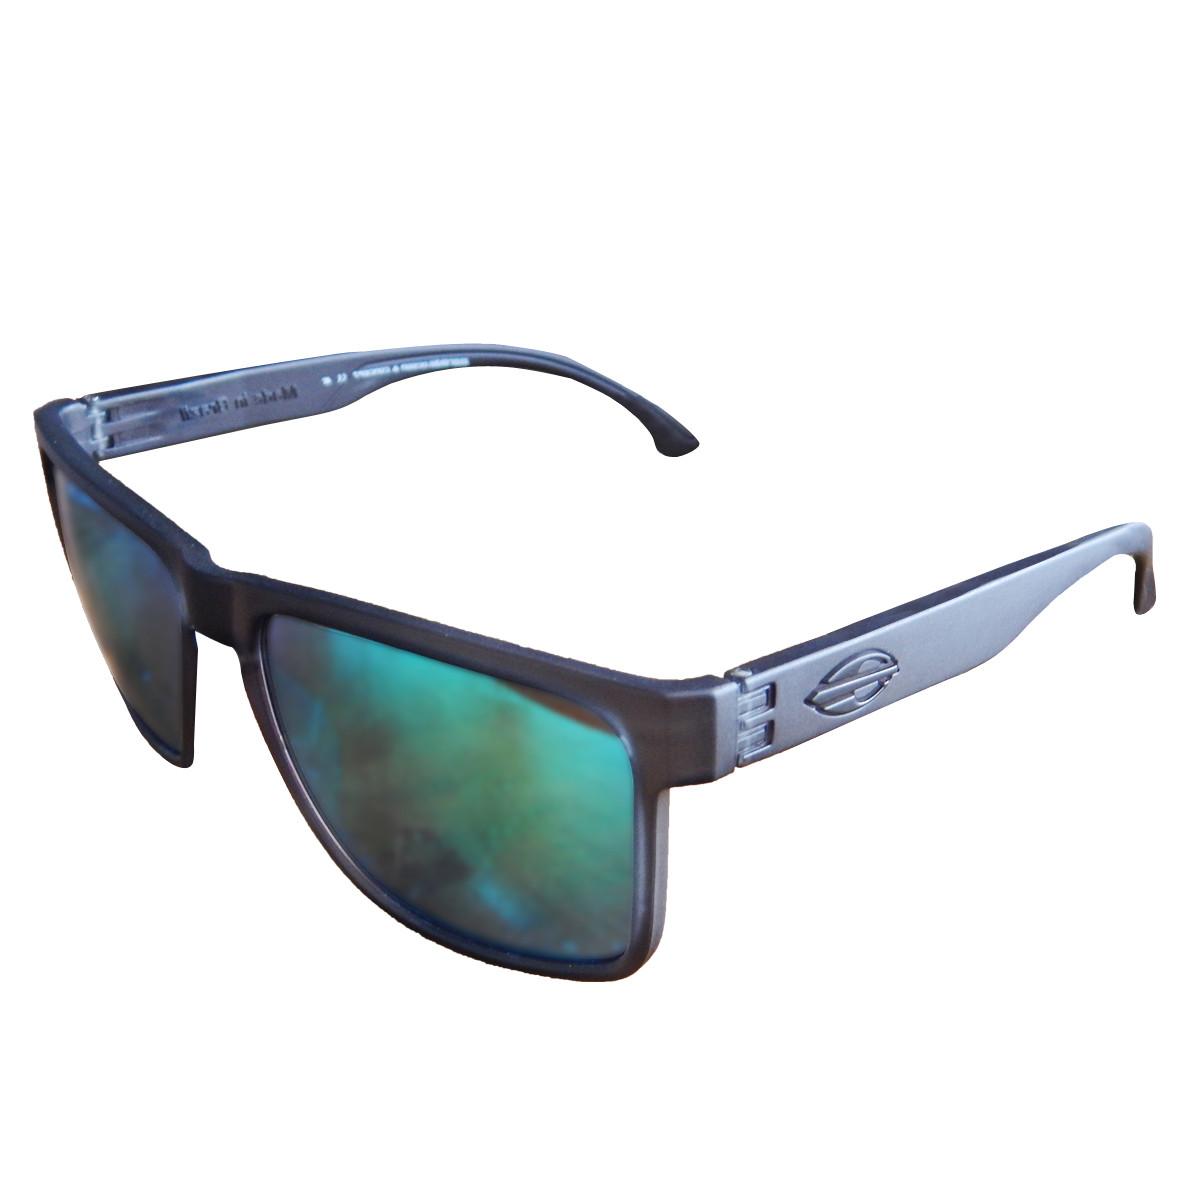 c101874f61af6 Óculos Mormaii Monterey Preto Fume Fosco  Lente Verde ref M0029A2285